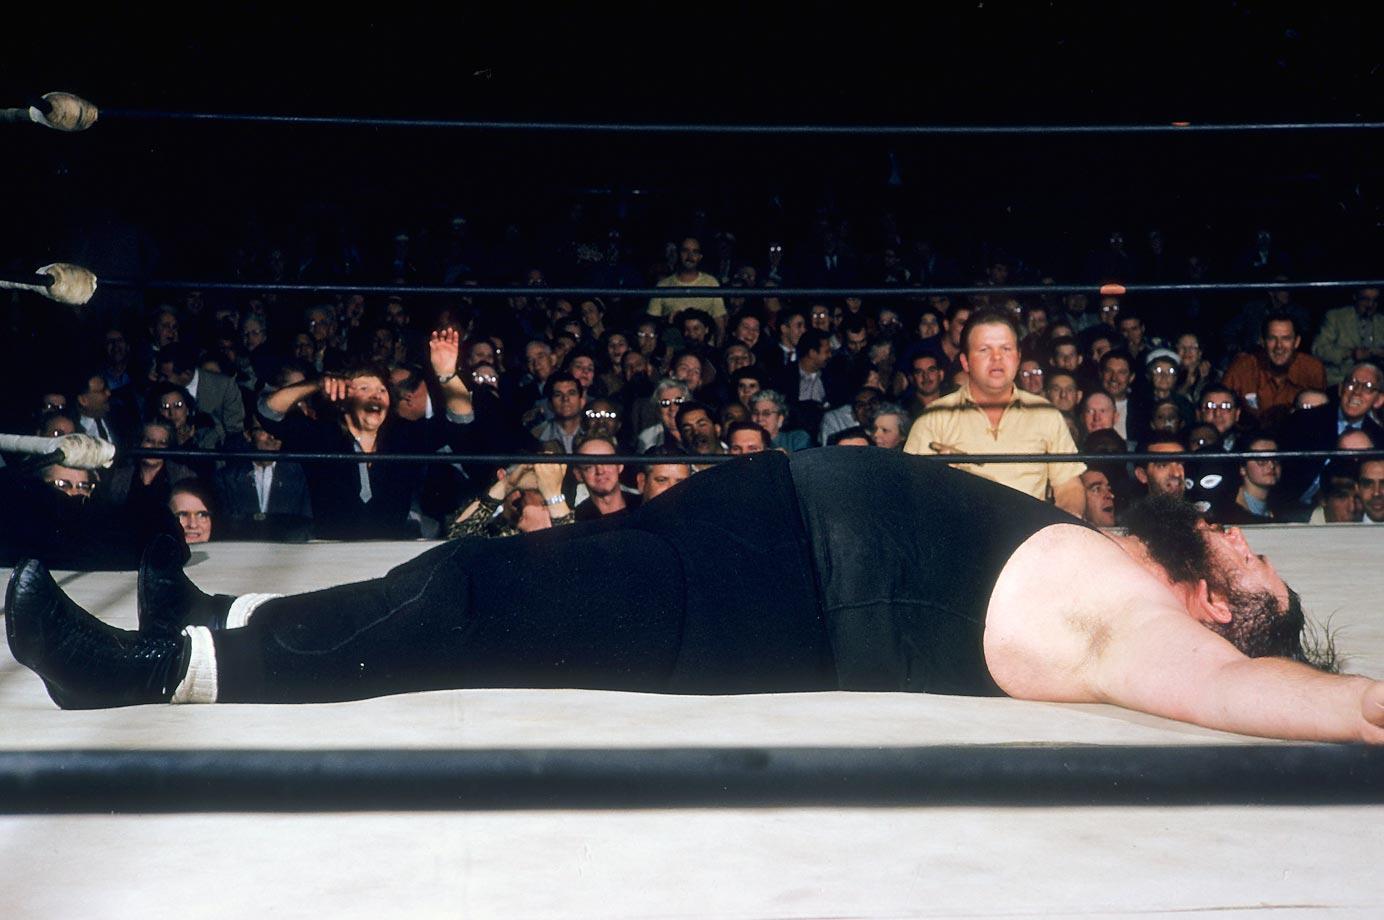 Man Mountain Dean Jr. down on his back during fight against Sandor Szabo.